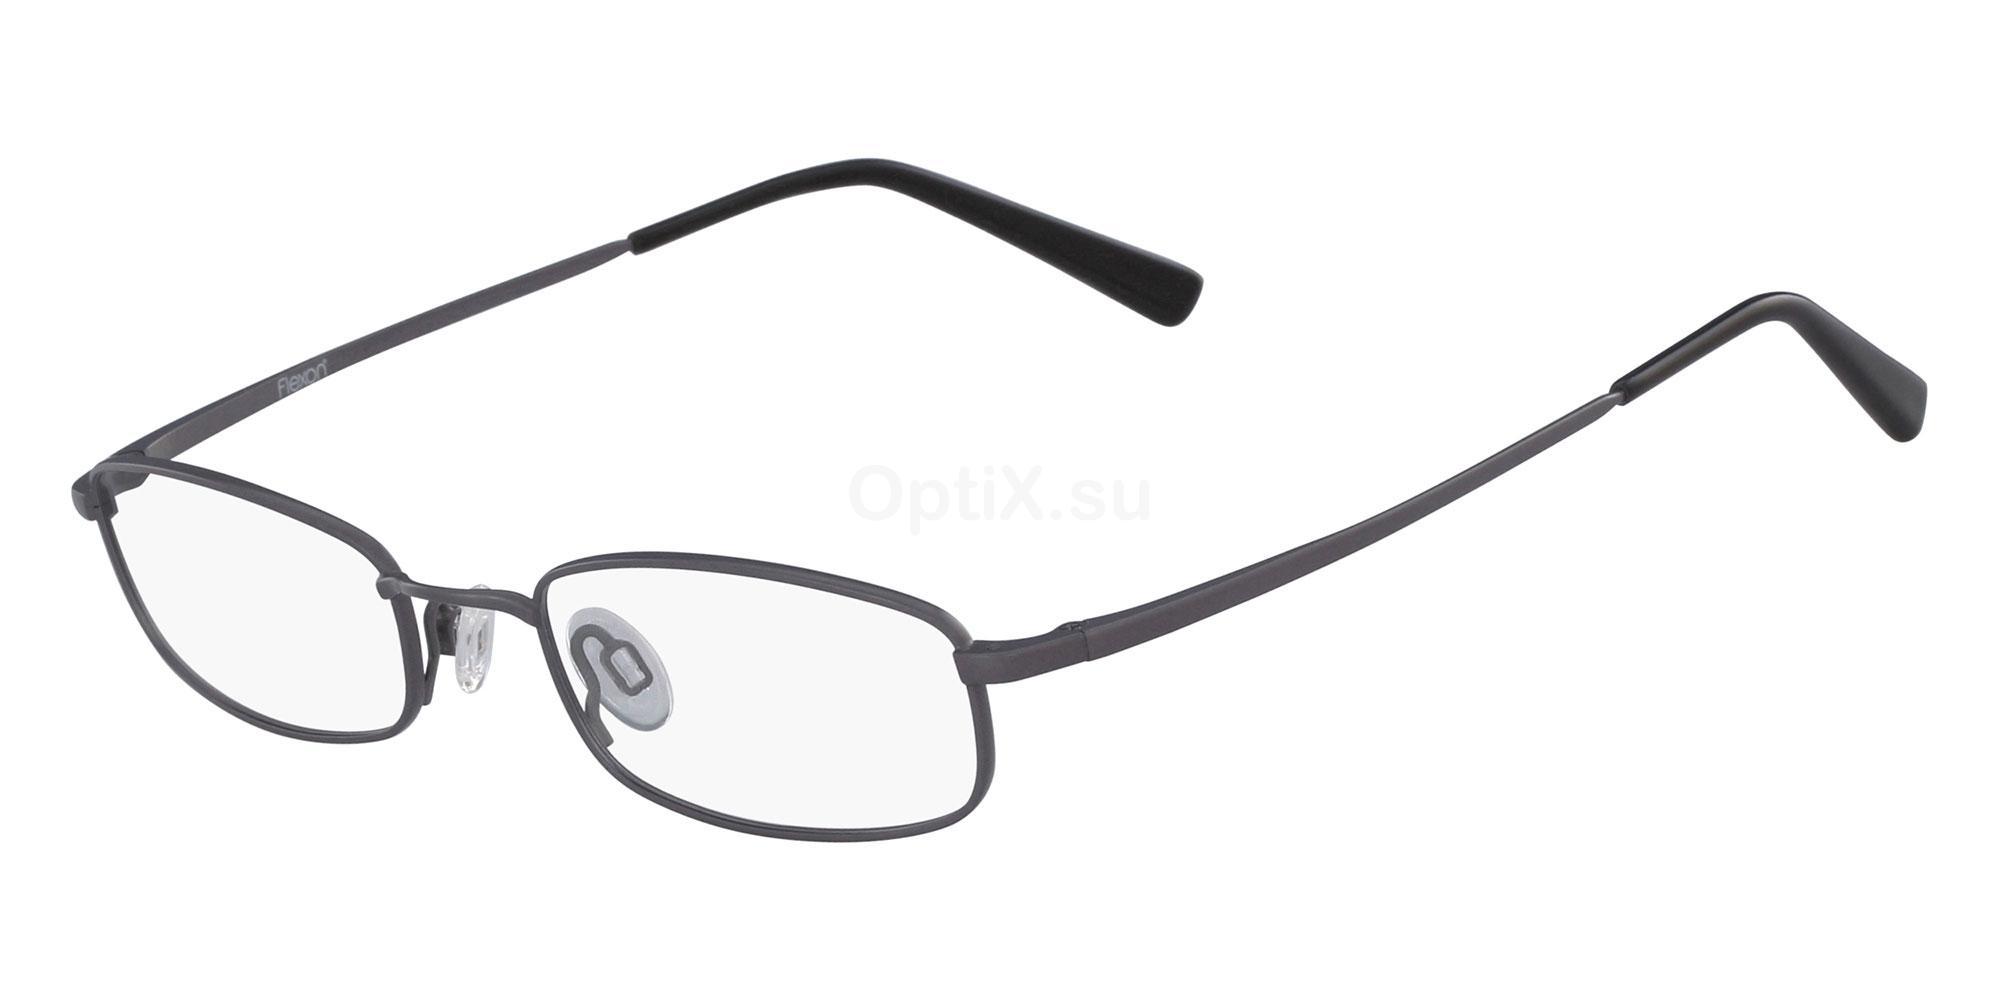 033 FLEXON ANDERSON 600 Glasses, Flexon